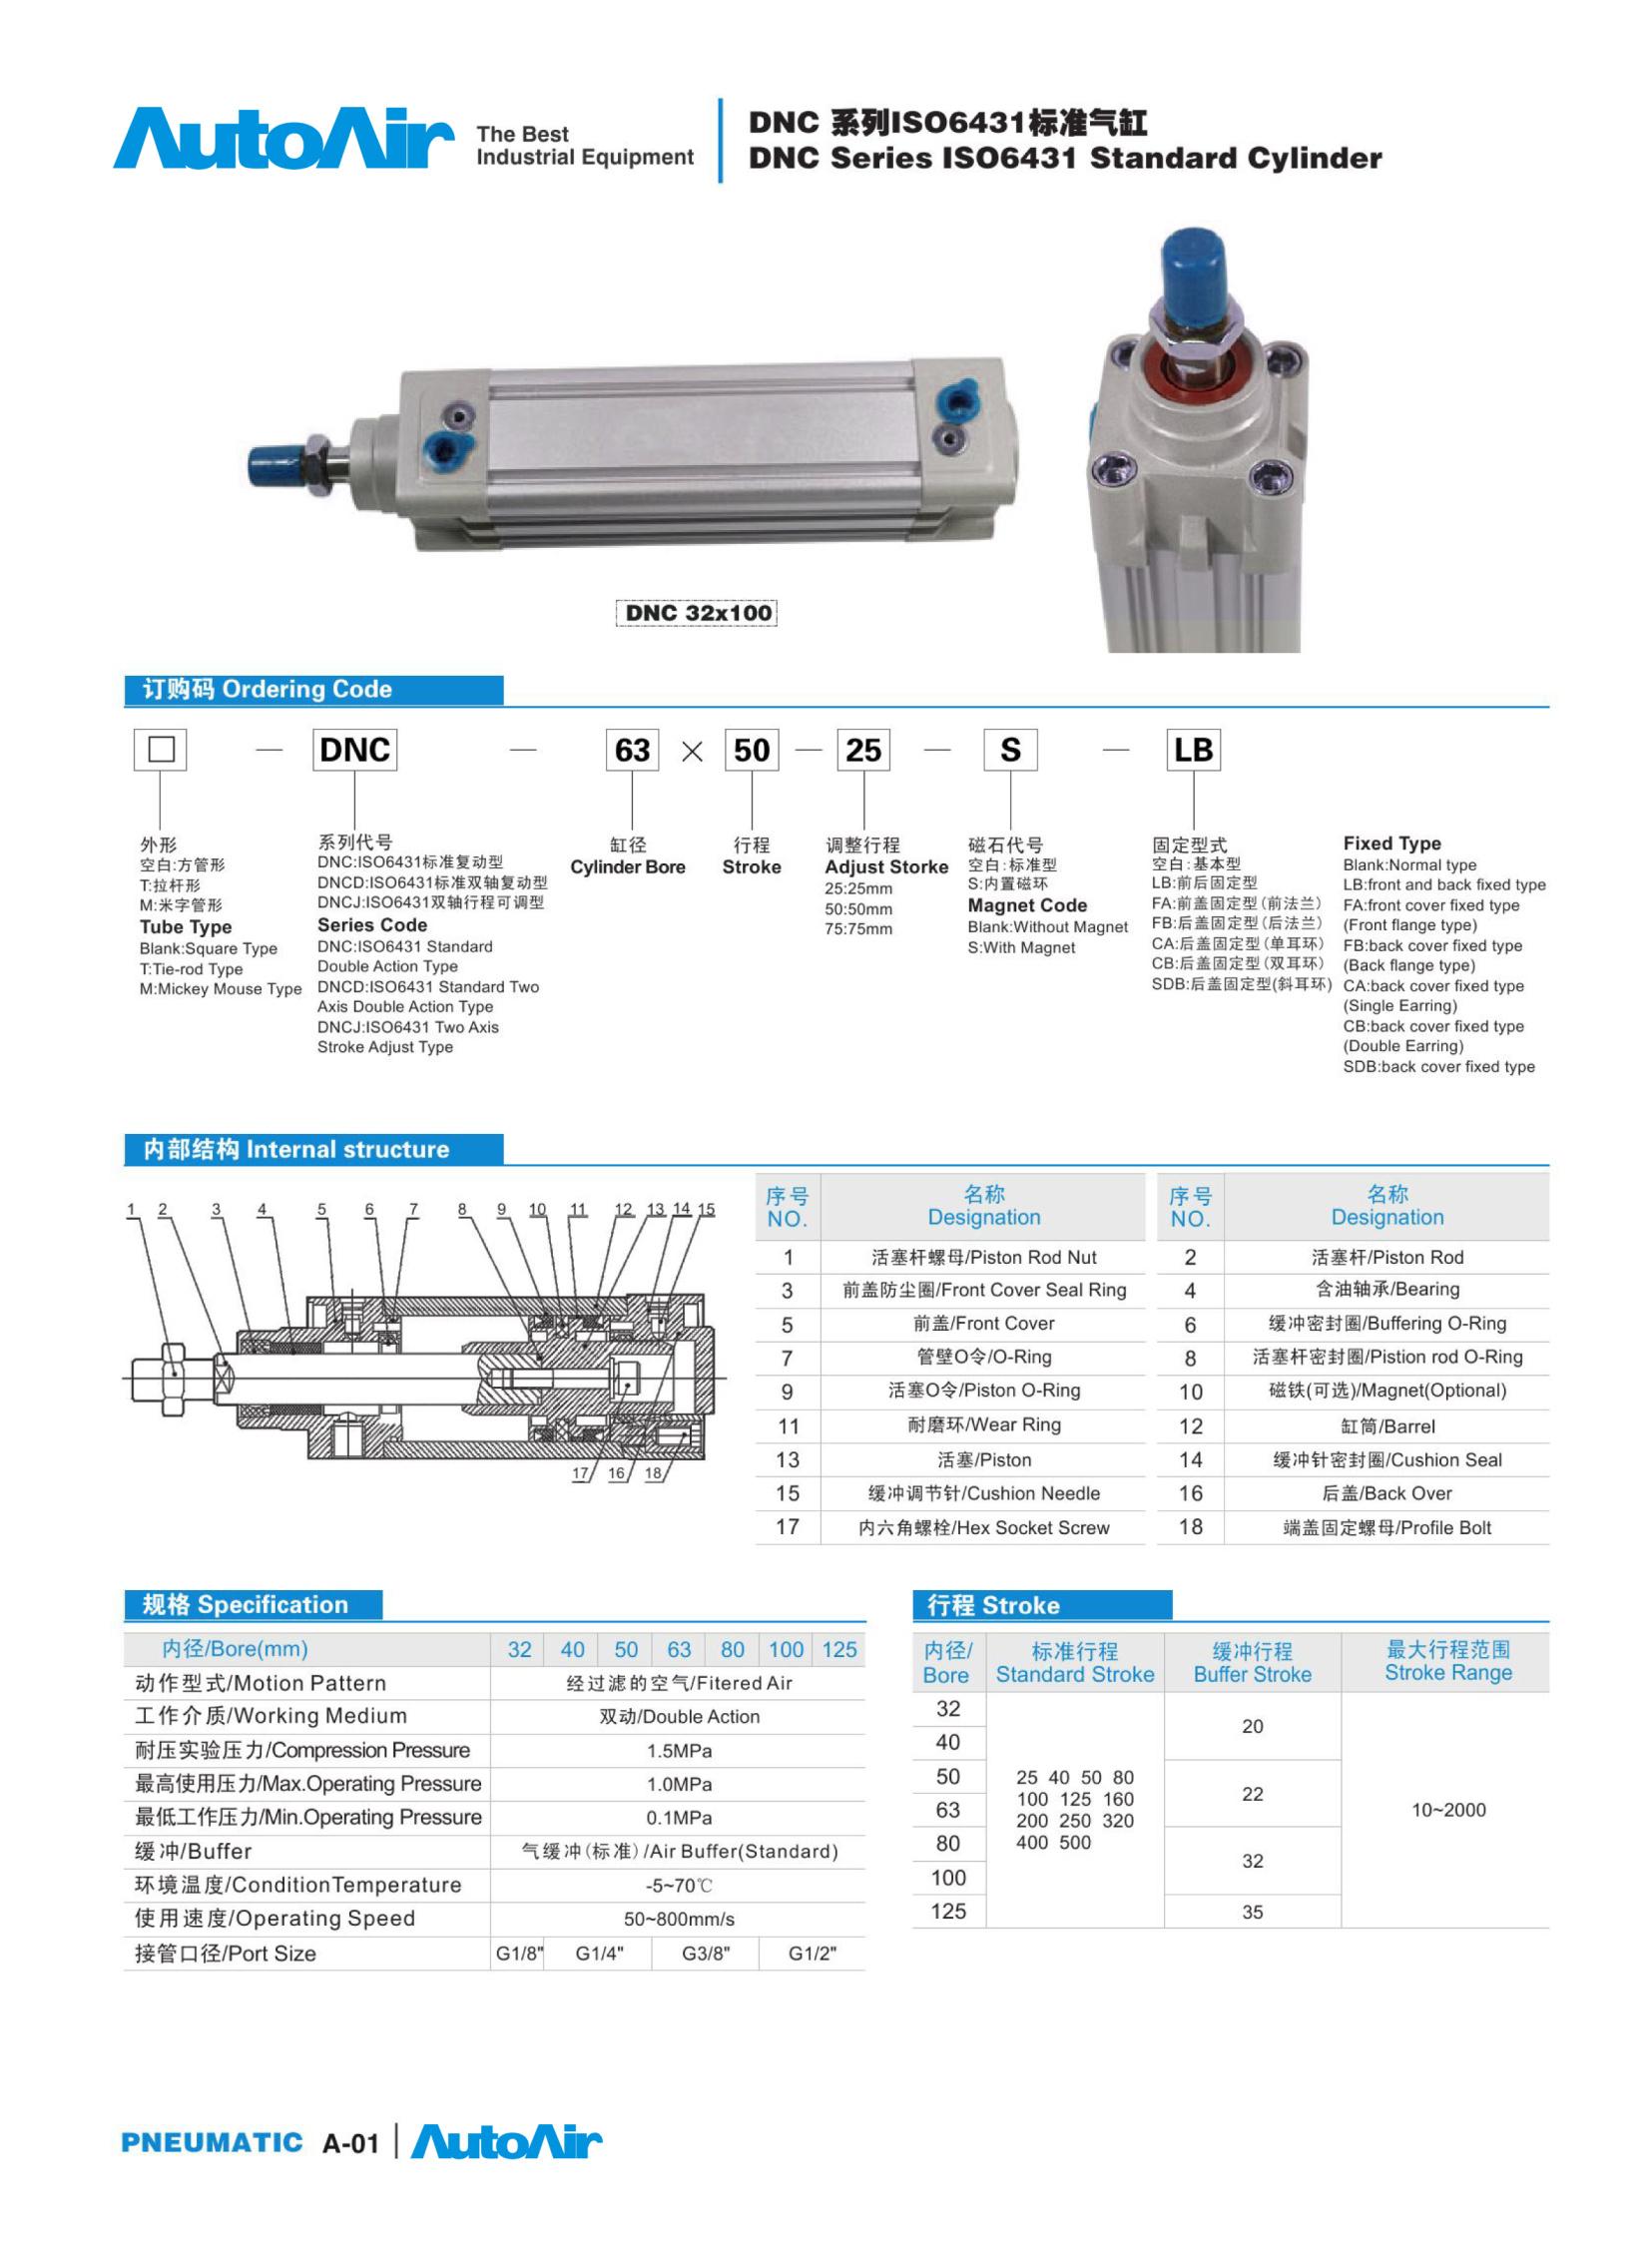 pneumatic cylinder(001)